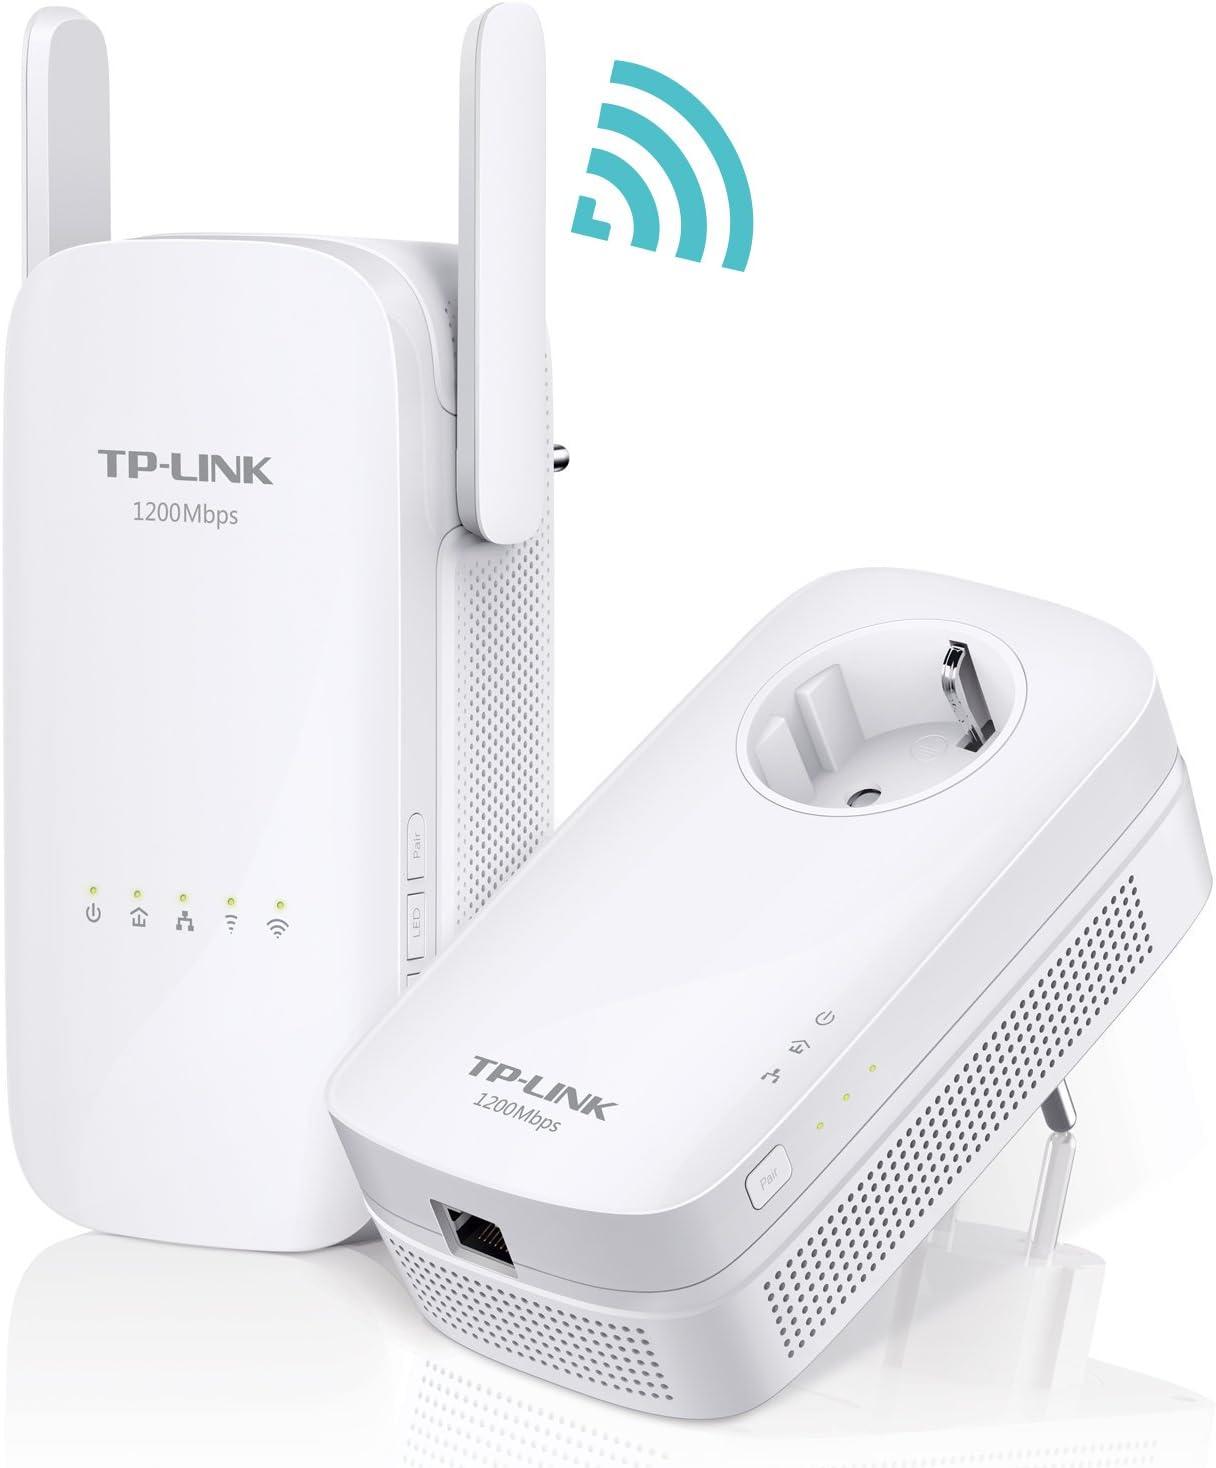 TP-Link AC1350 TL-WPA8630 - Kit Extensor de Red Powerline Ver 2.0(1350 Mbps de Banda Dual, AV1300 Powerline Speed, Gigabit, 2 x 2 MIMO, Plug and Play, ...